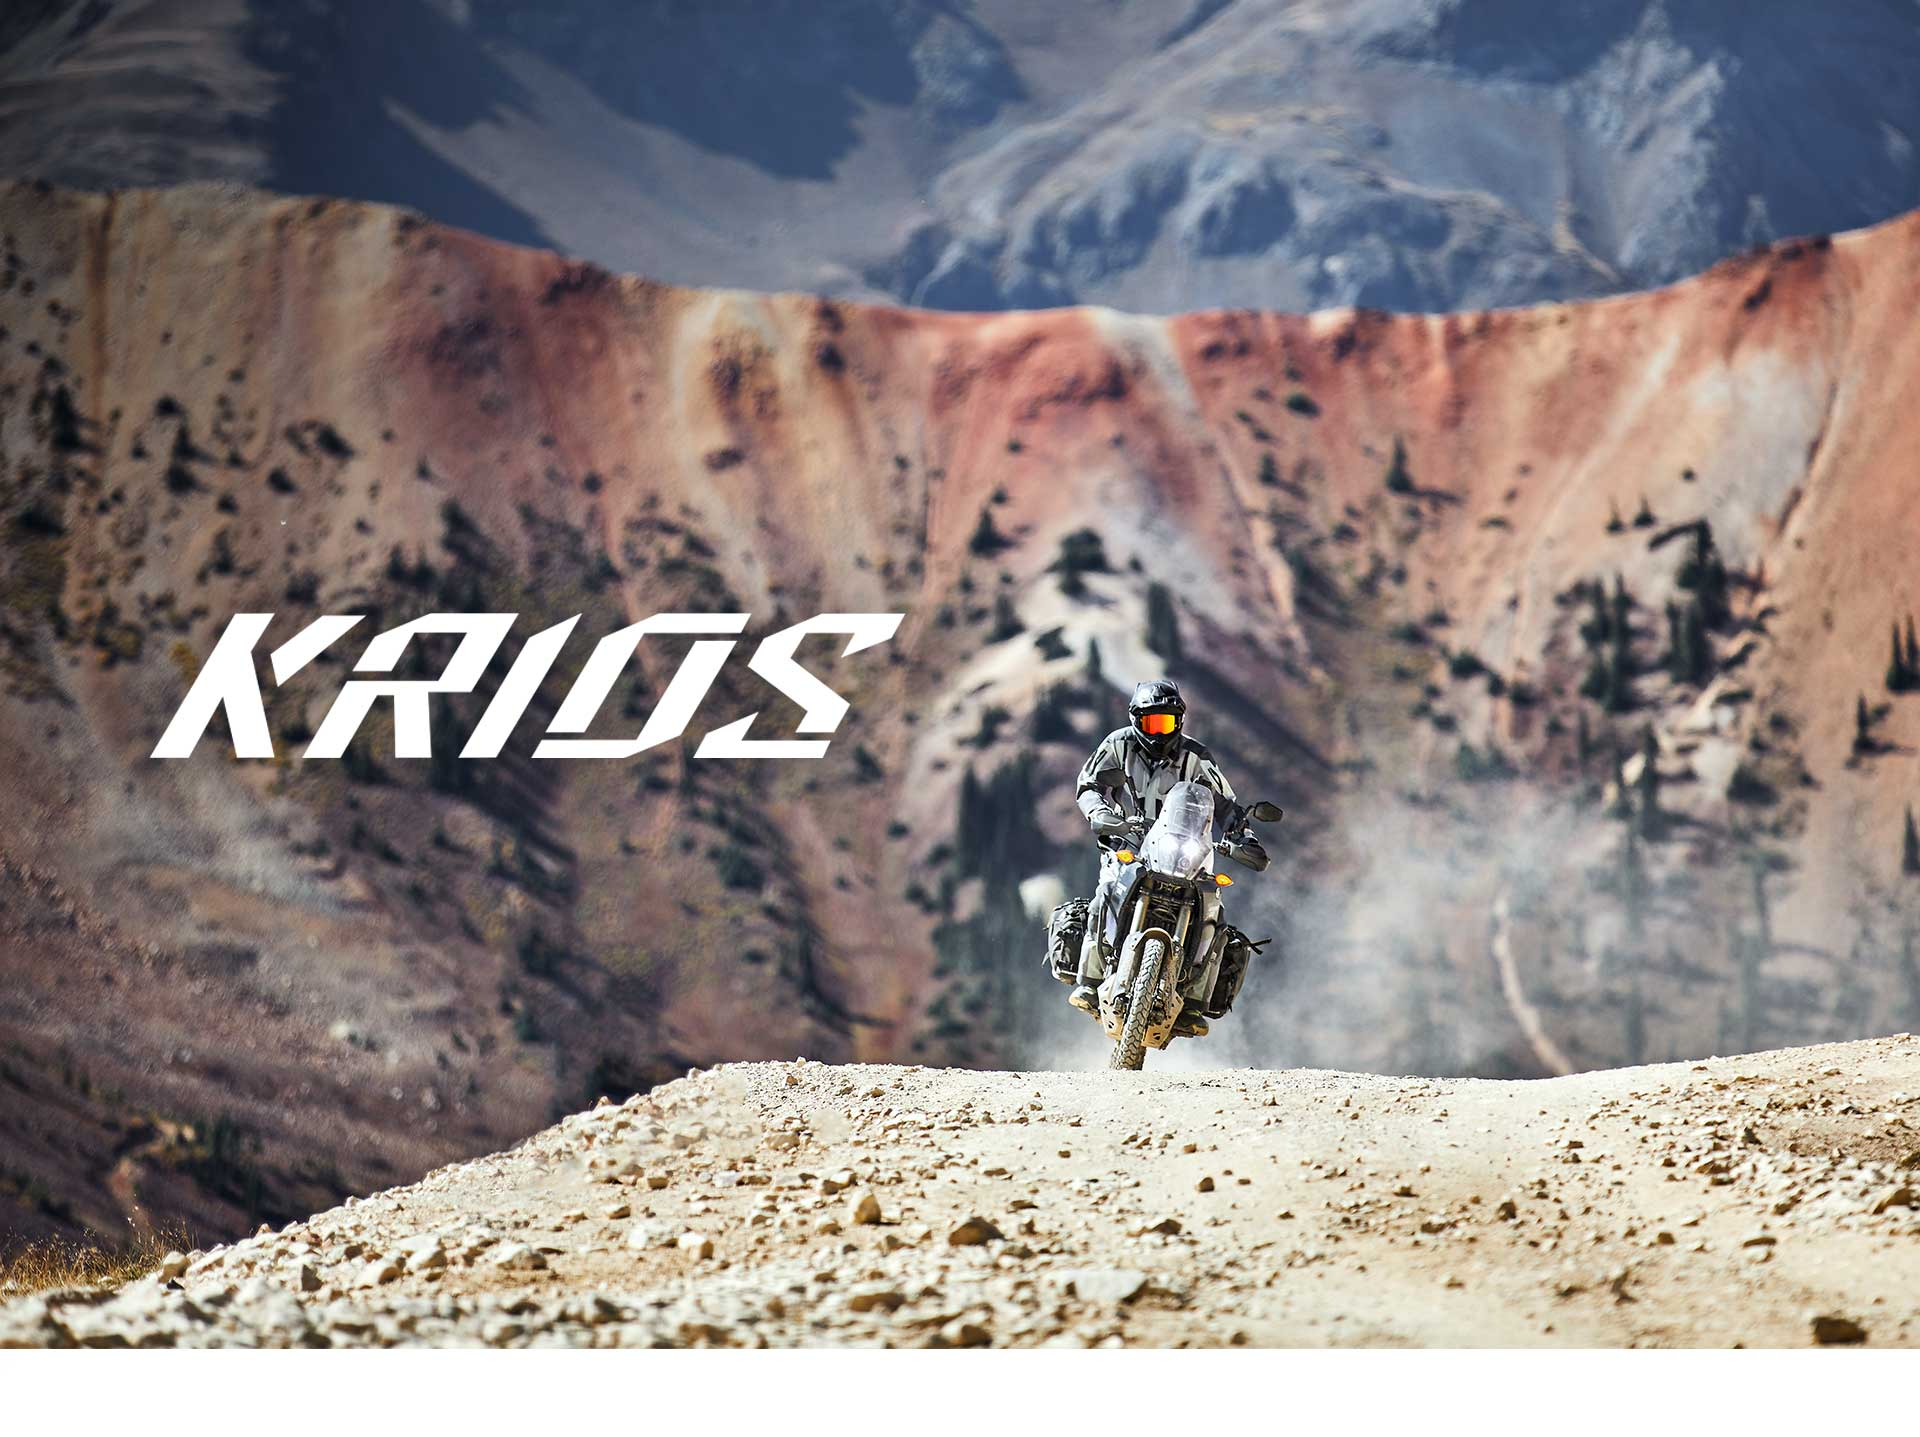 Krios1